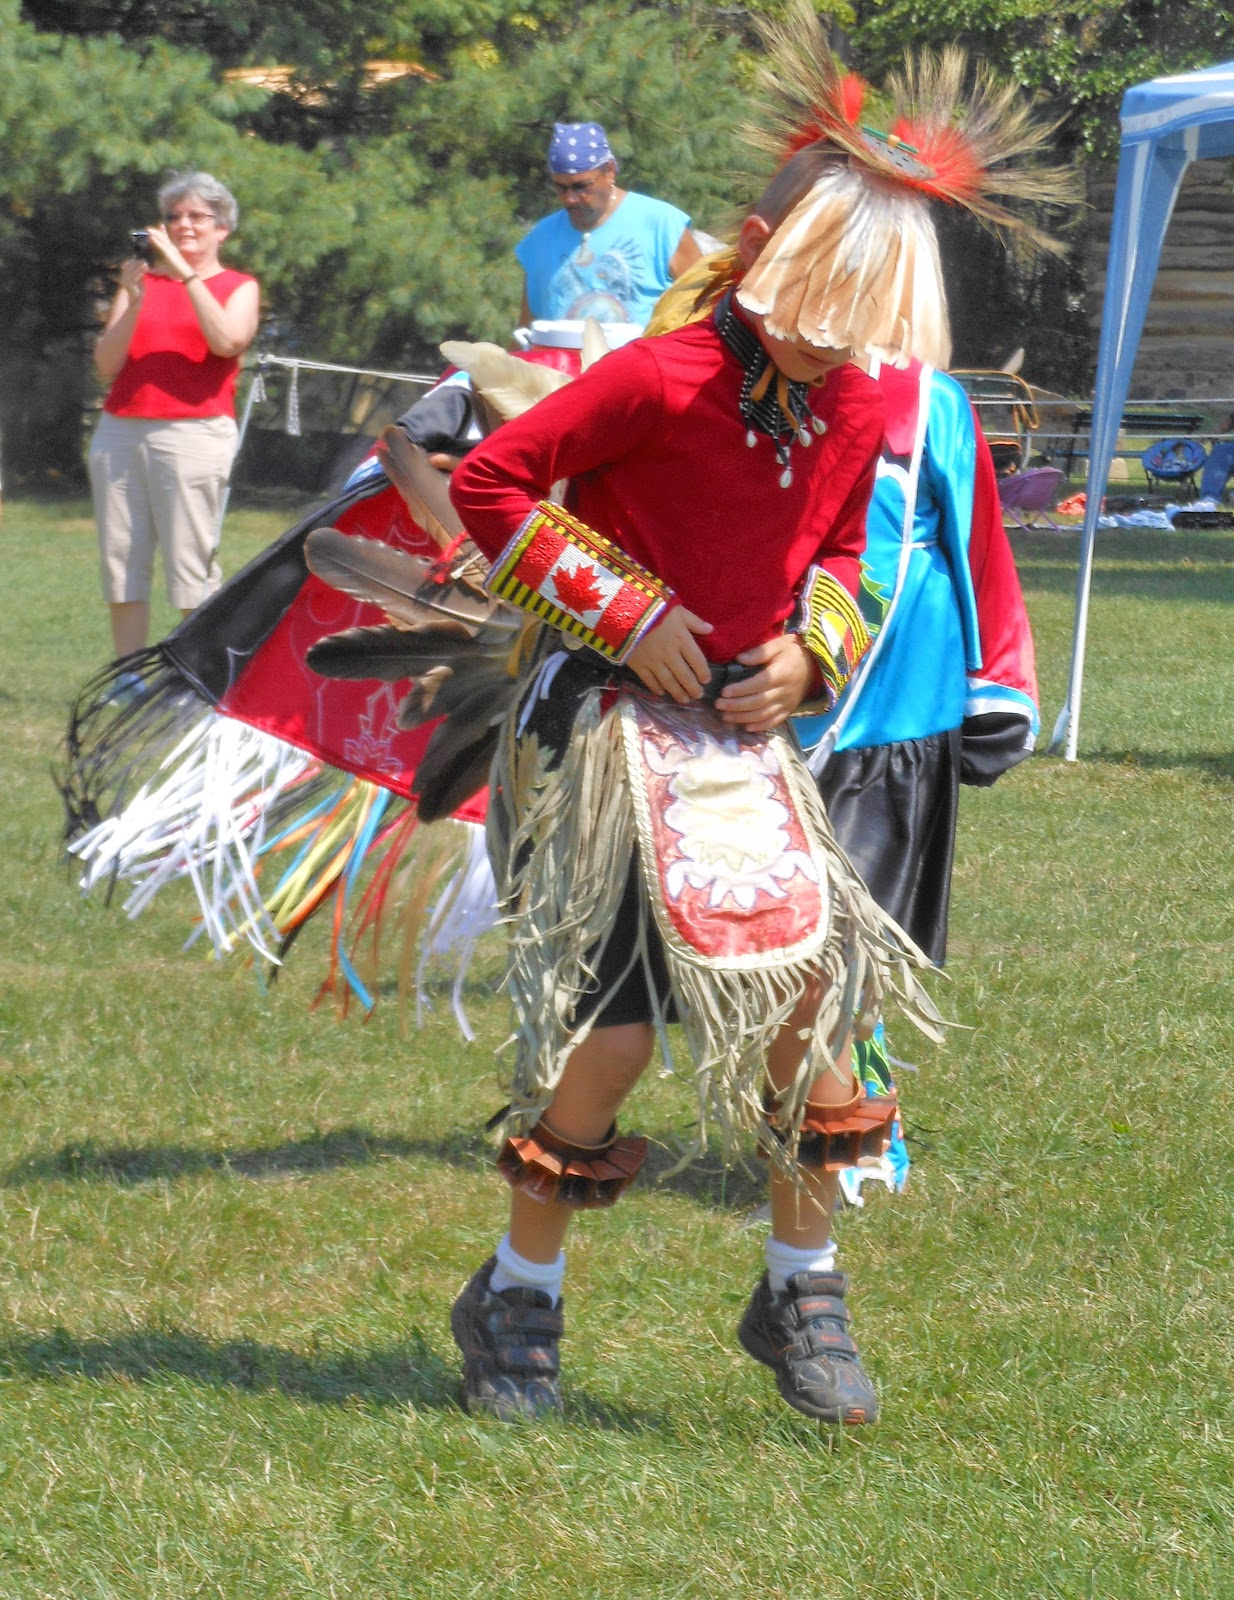 http://2.bp.blogspot.com/-3caHJ3U2ov8/UEdGXsMXybI/AAAAAAAAL64/ZWjXQQbsekE/s1600/young+dancer+2.jpg